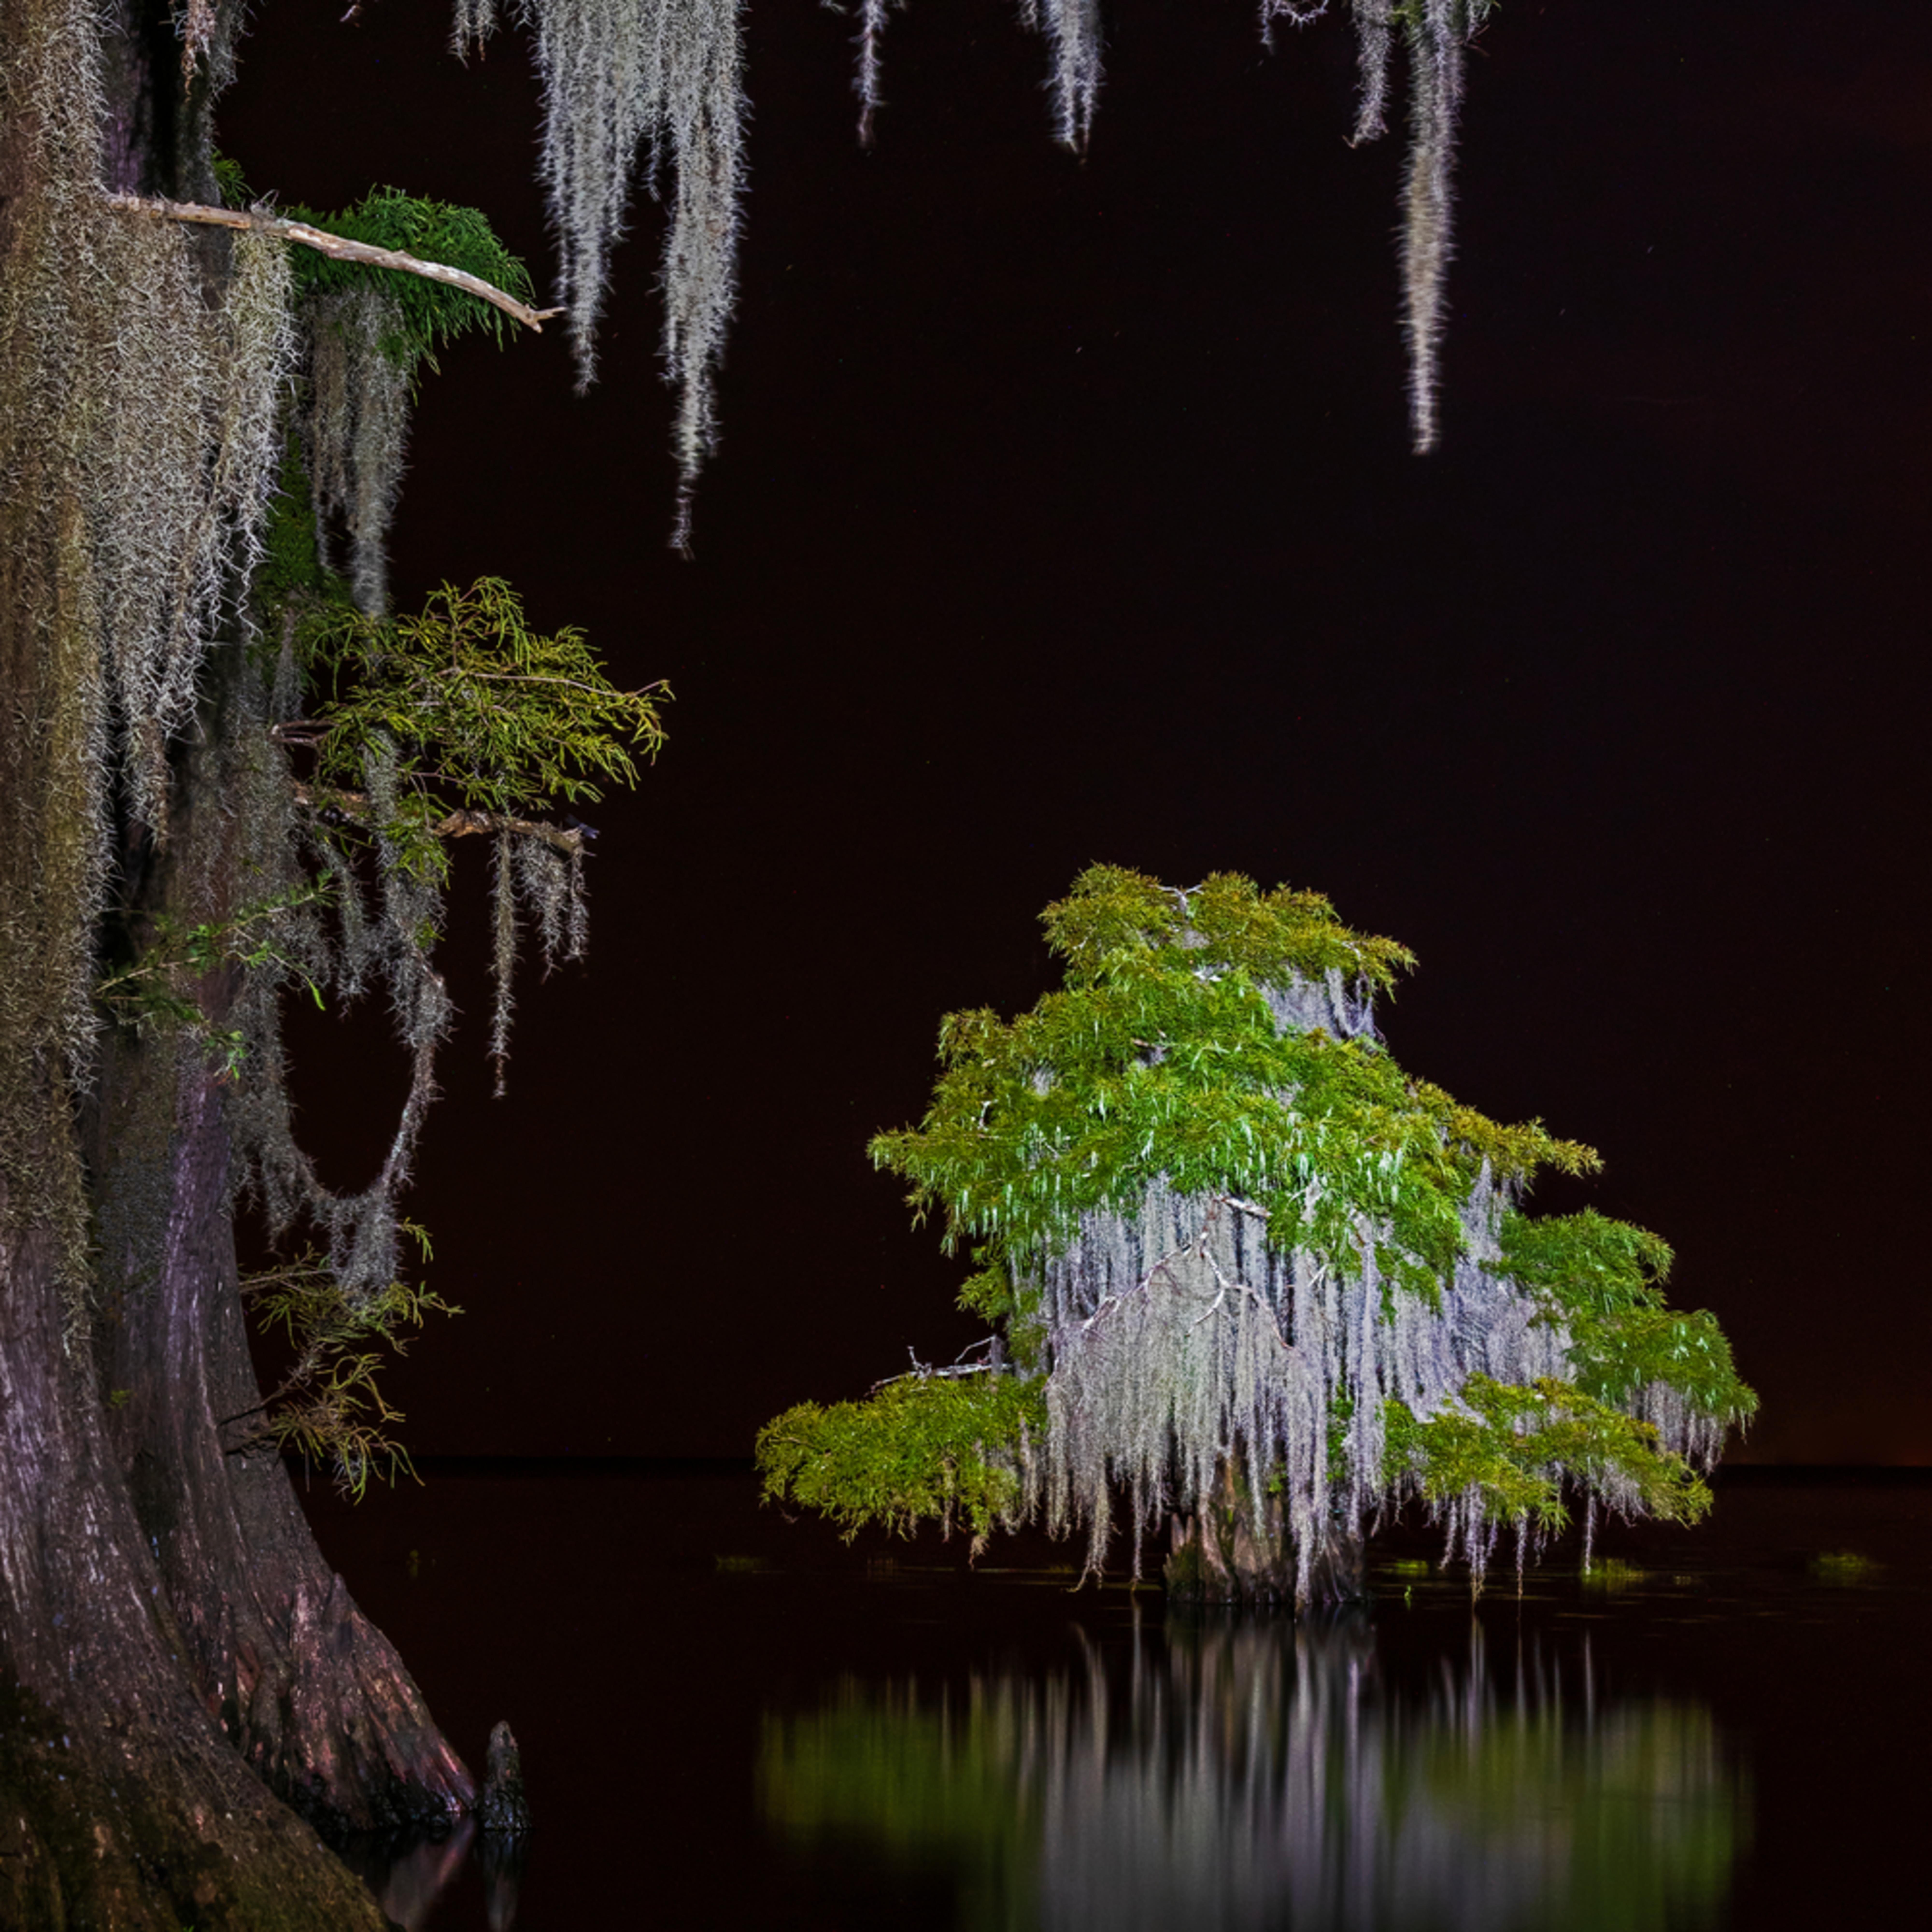 Andy crawford photography lake maurepas 004 b90ism